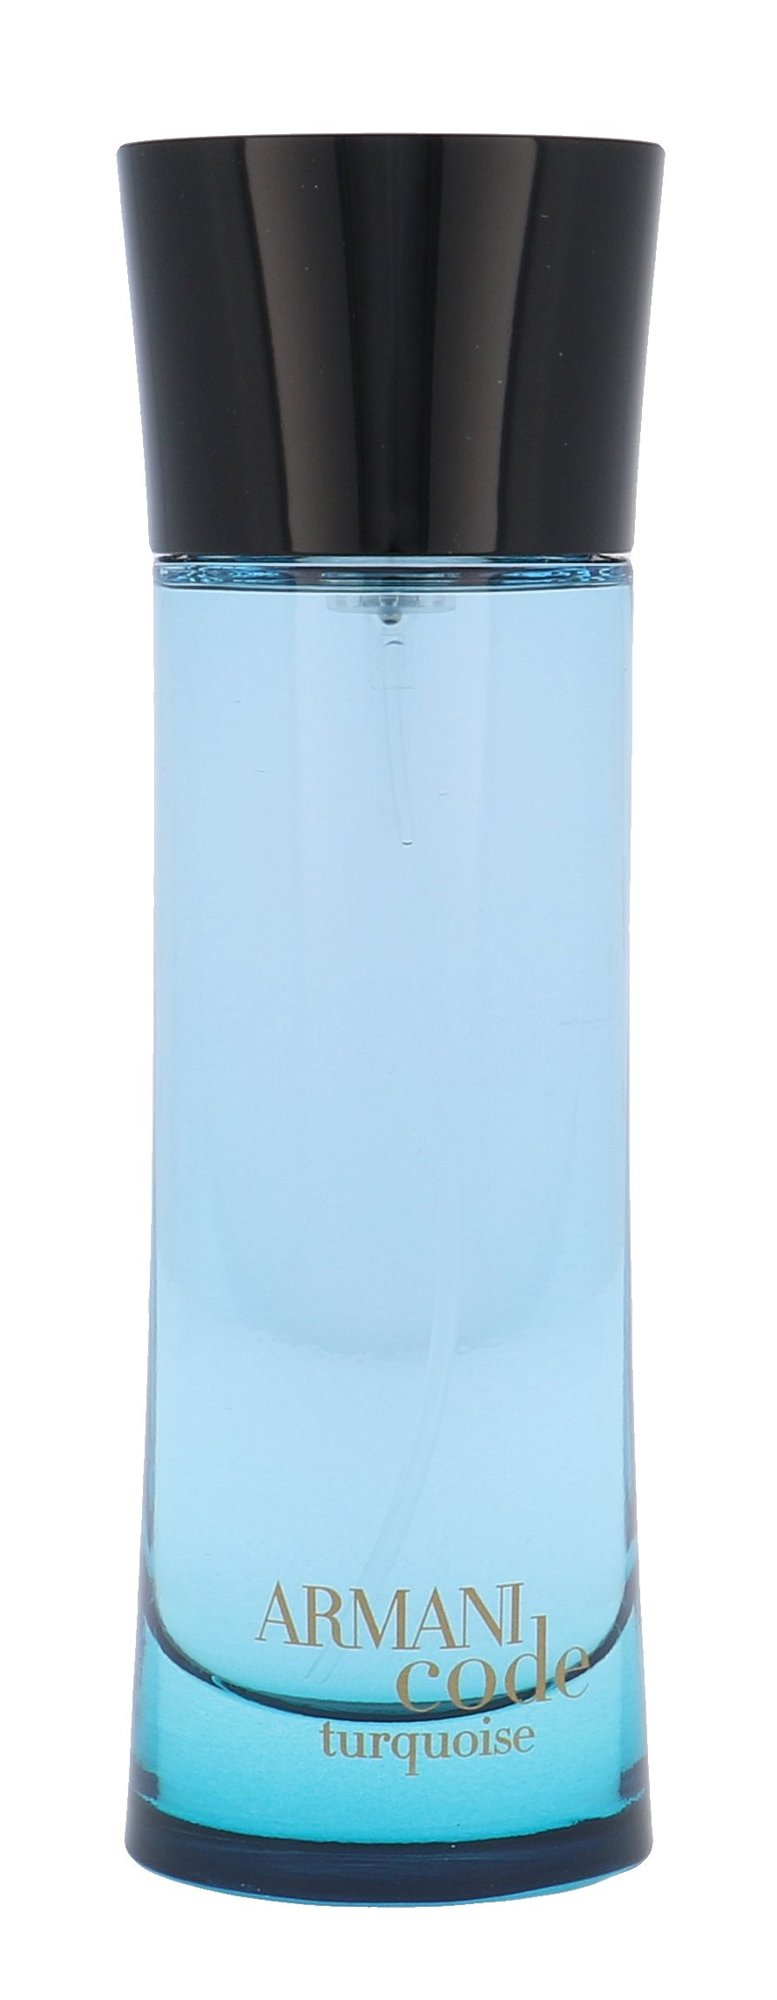 Giorgio Armani Code Turquoise Eau de Fraiche 75ml